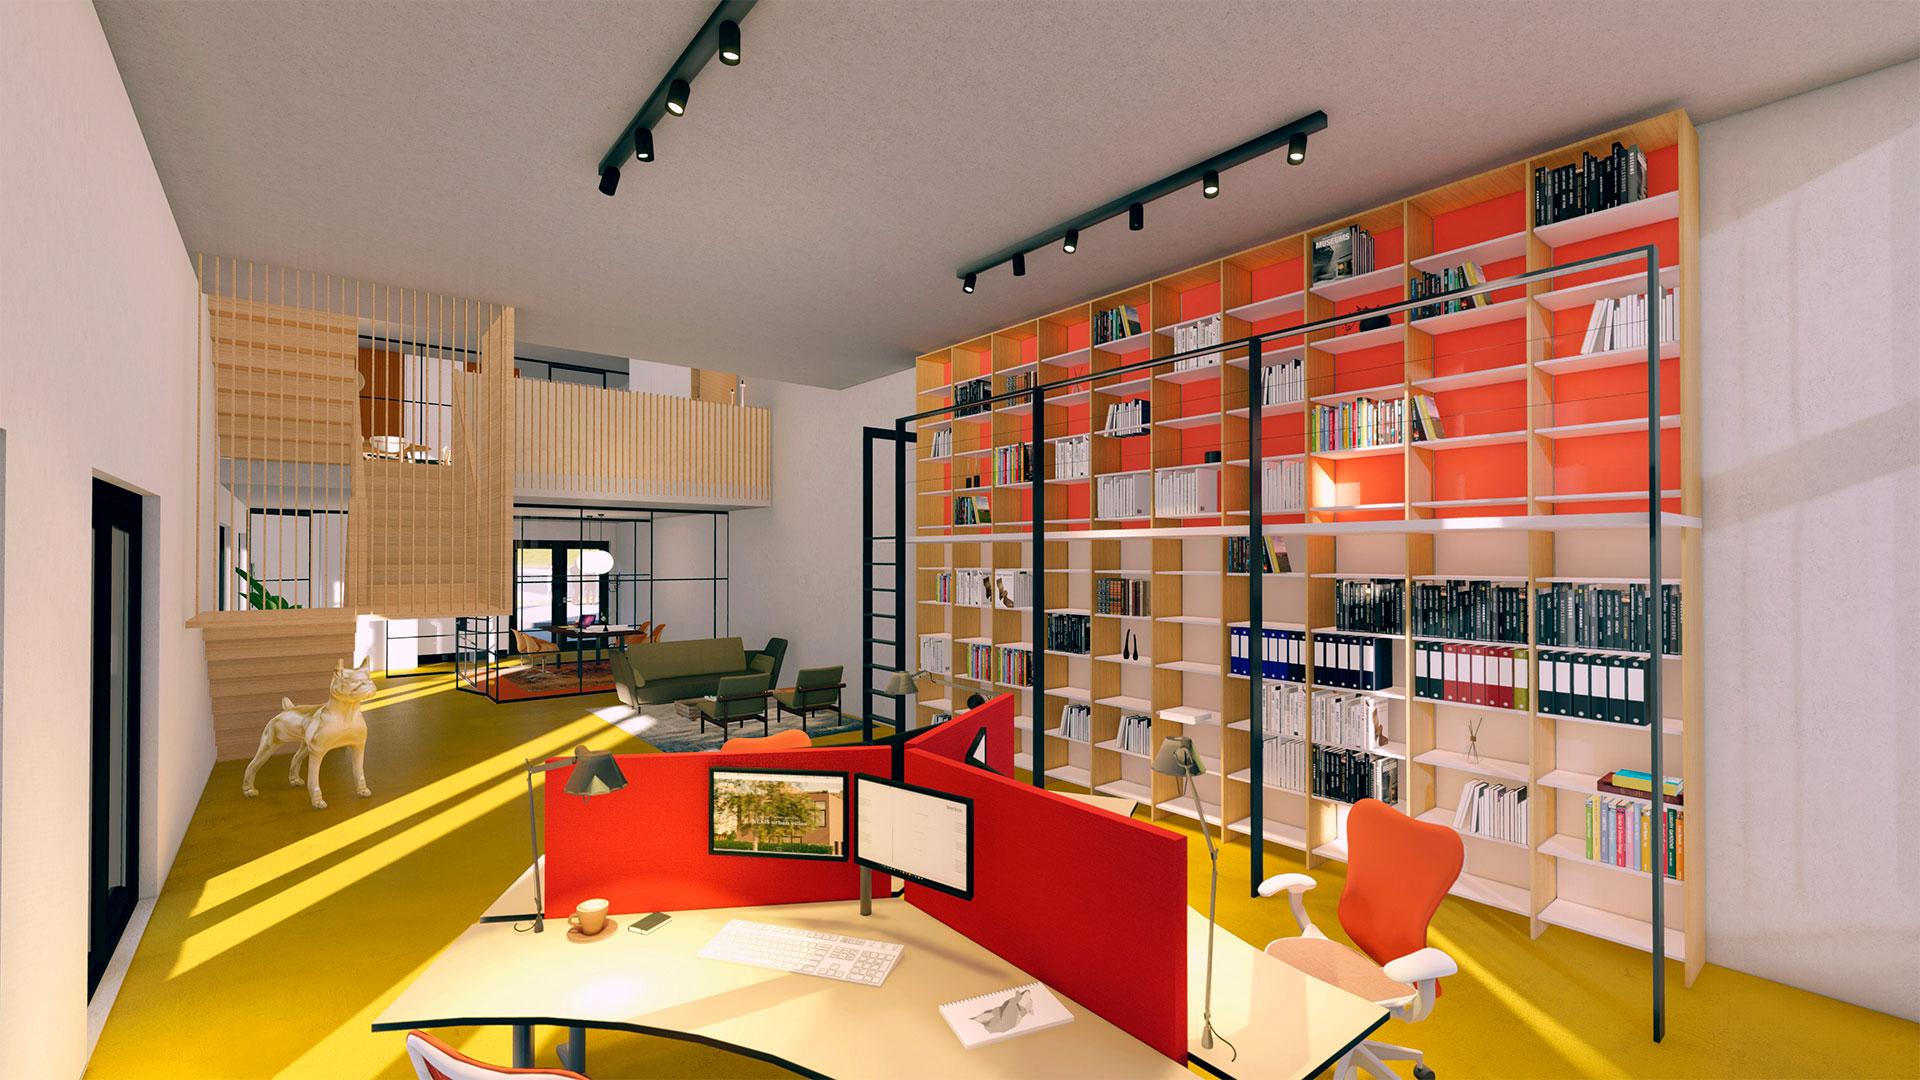 nexis-urban-villas-kantoor.jpg